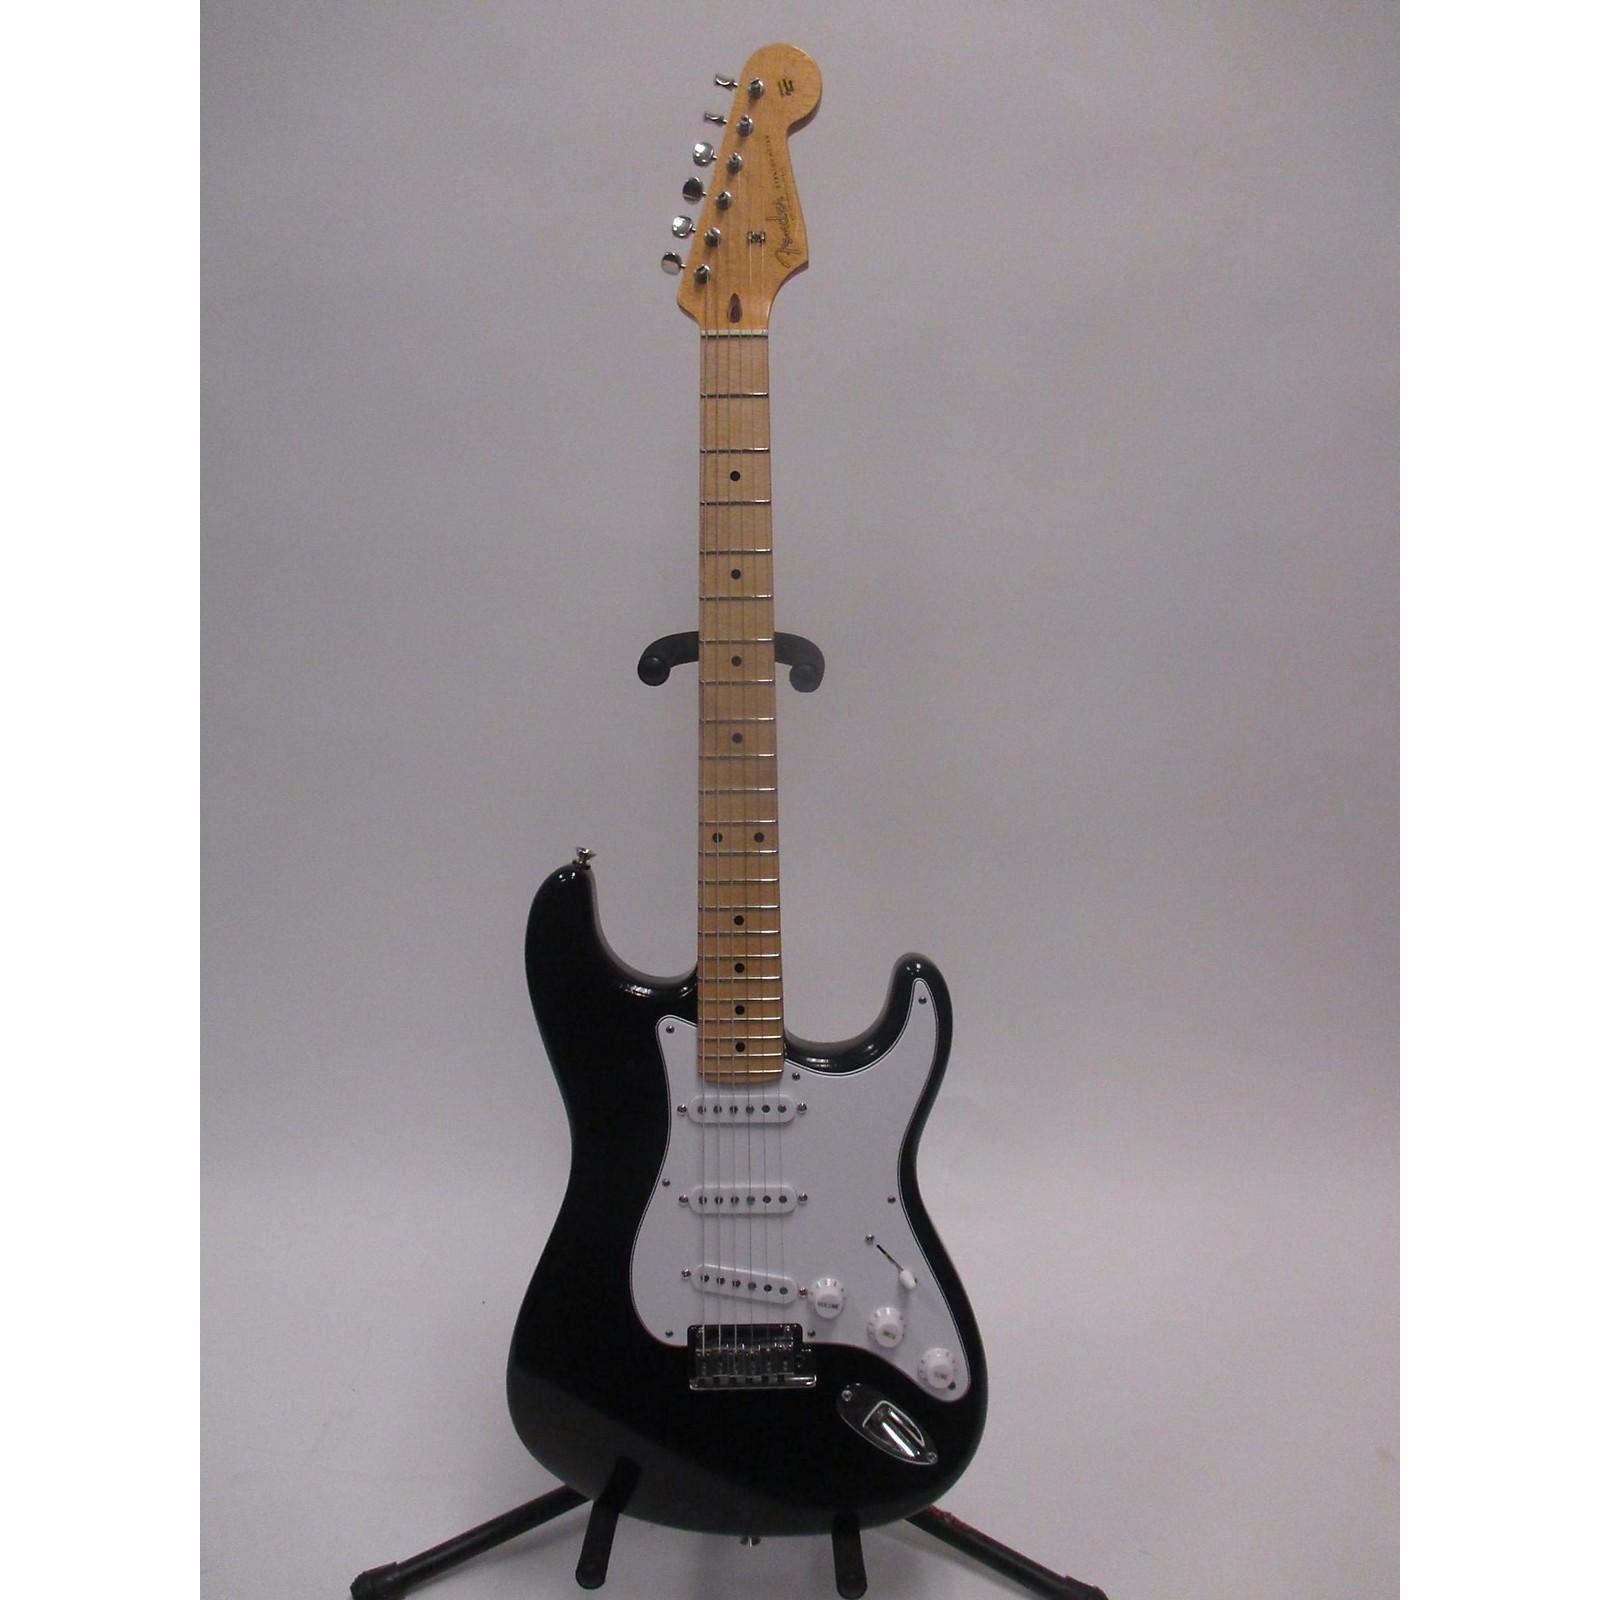 Fender 2012 Custom Shop Stratocaster Pro Closet Classic Solid Body Electric Guitar